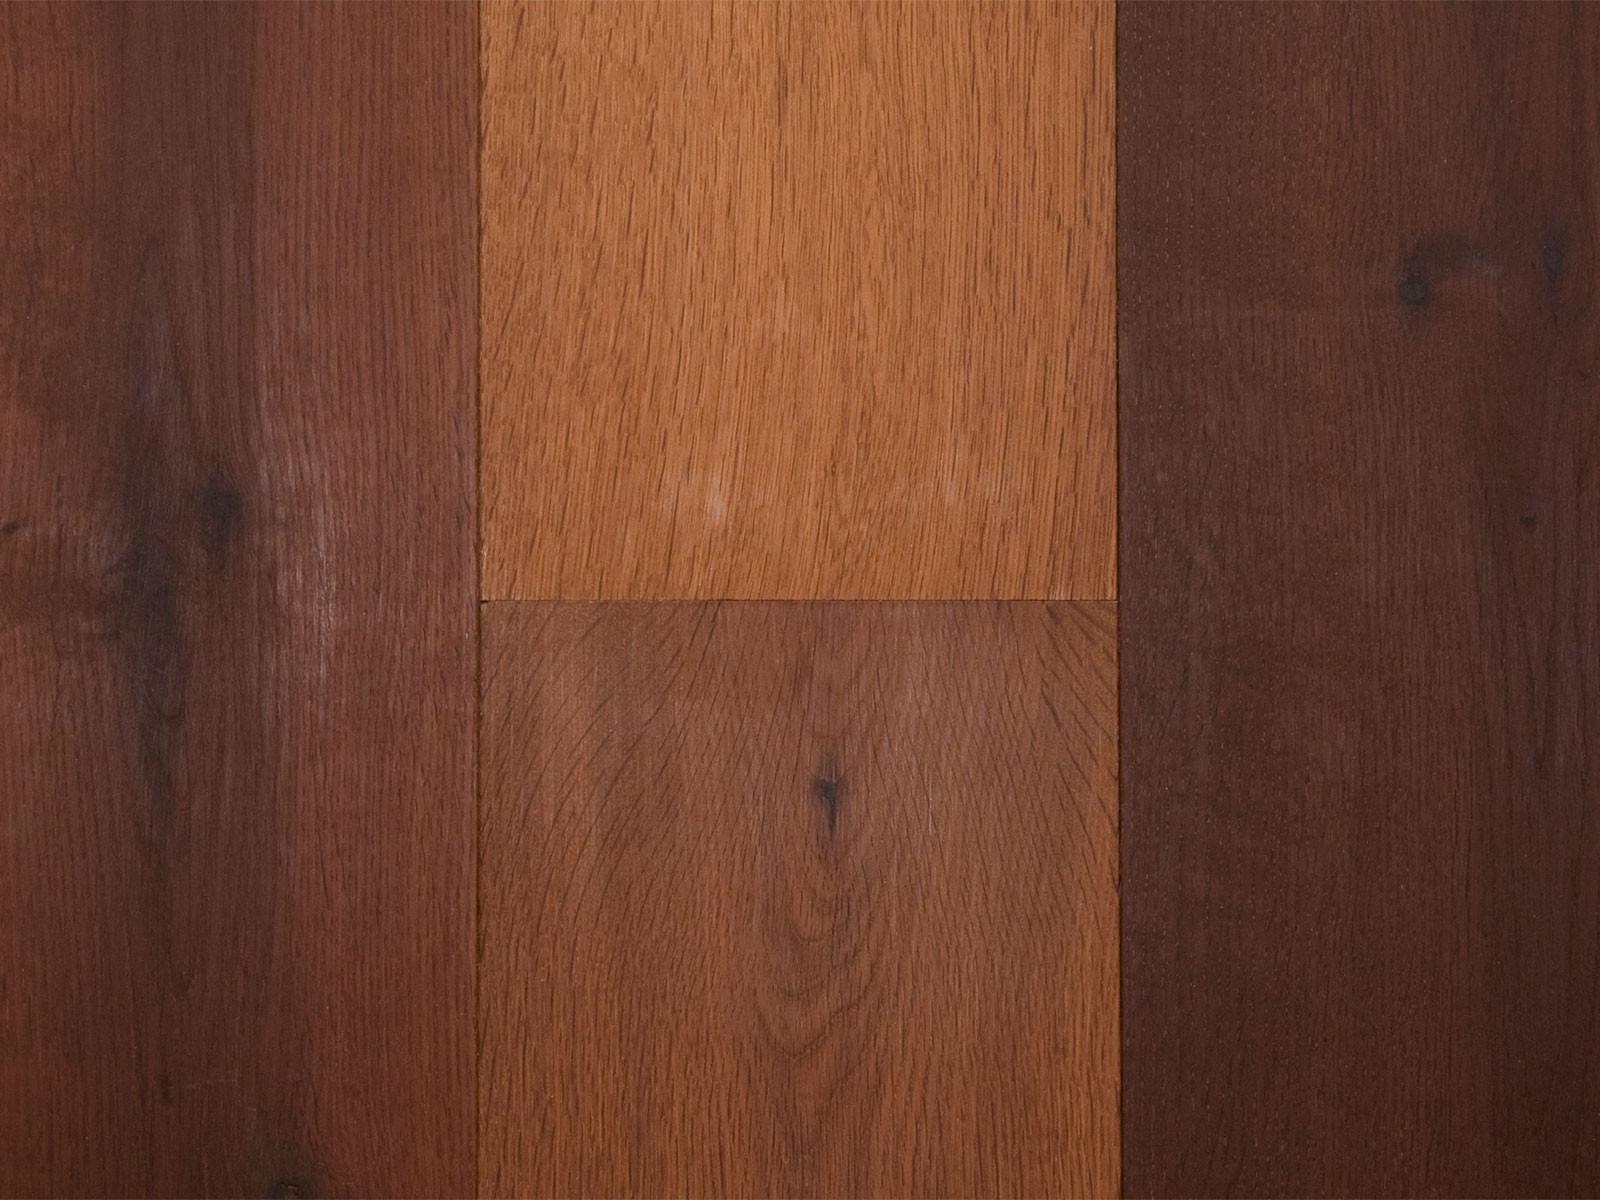 columbia hardwood flooring distributors of duchateau hardwood flooring houston tx discount engineered wood in savoy european oak